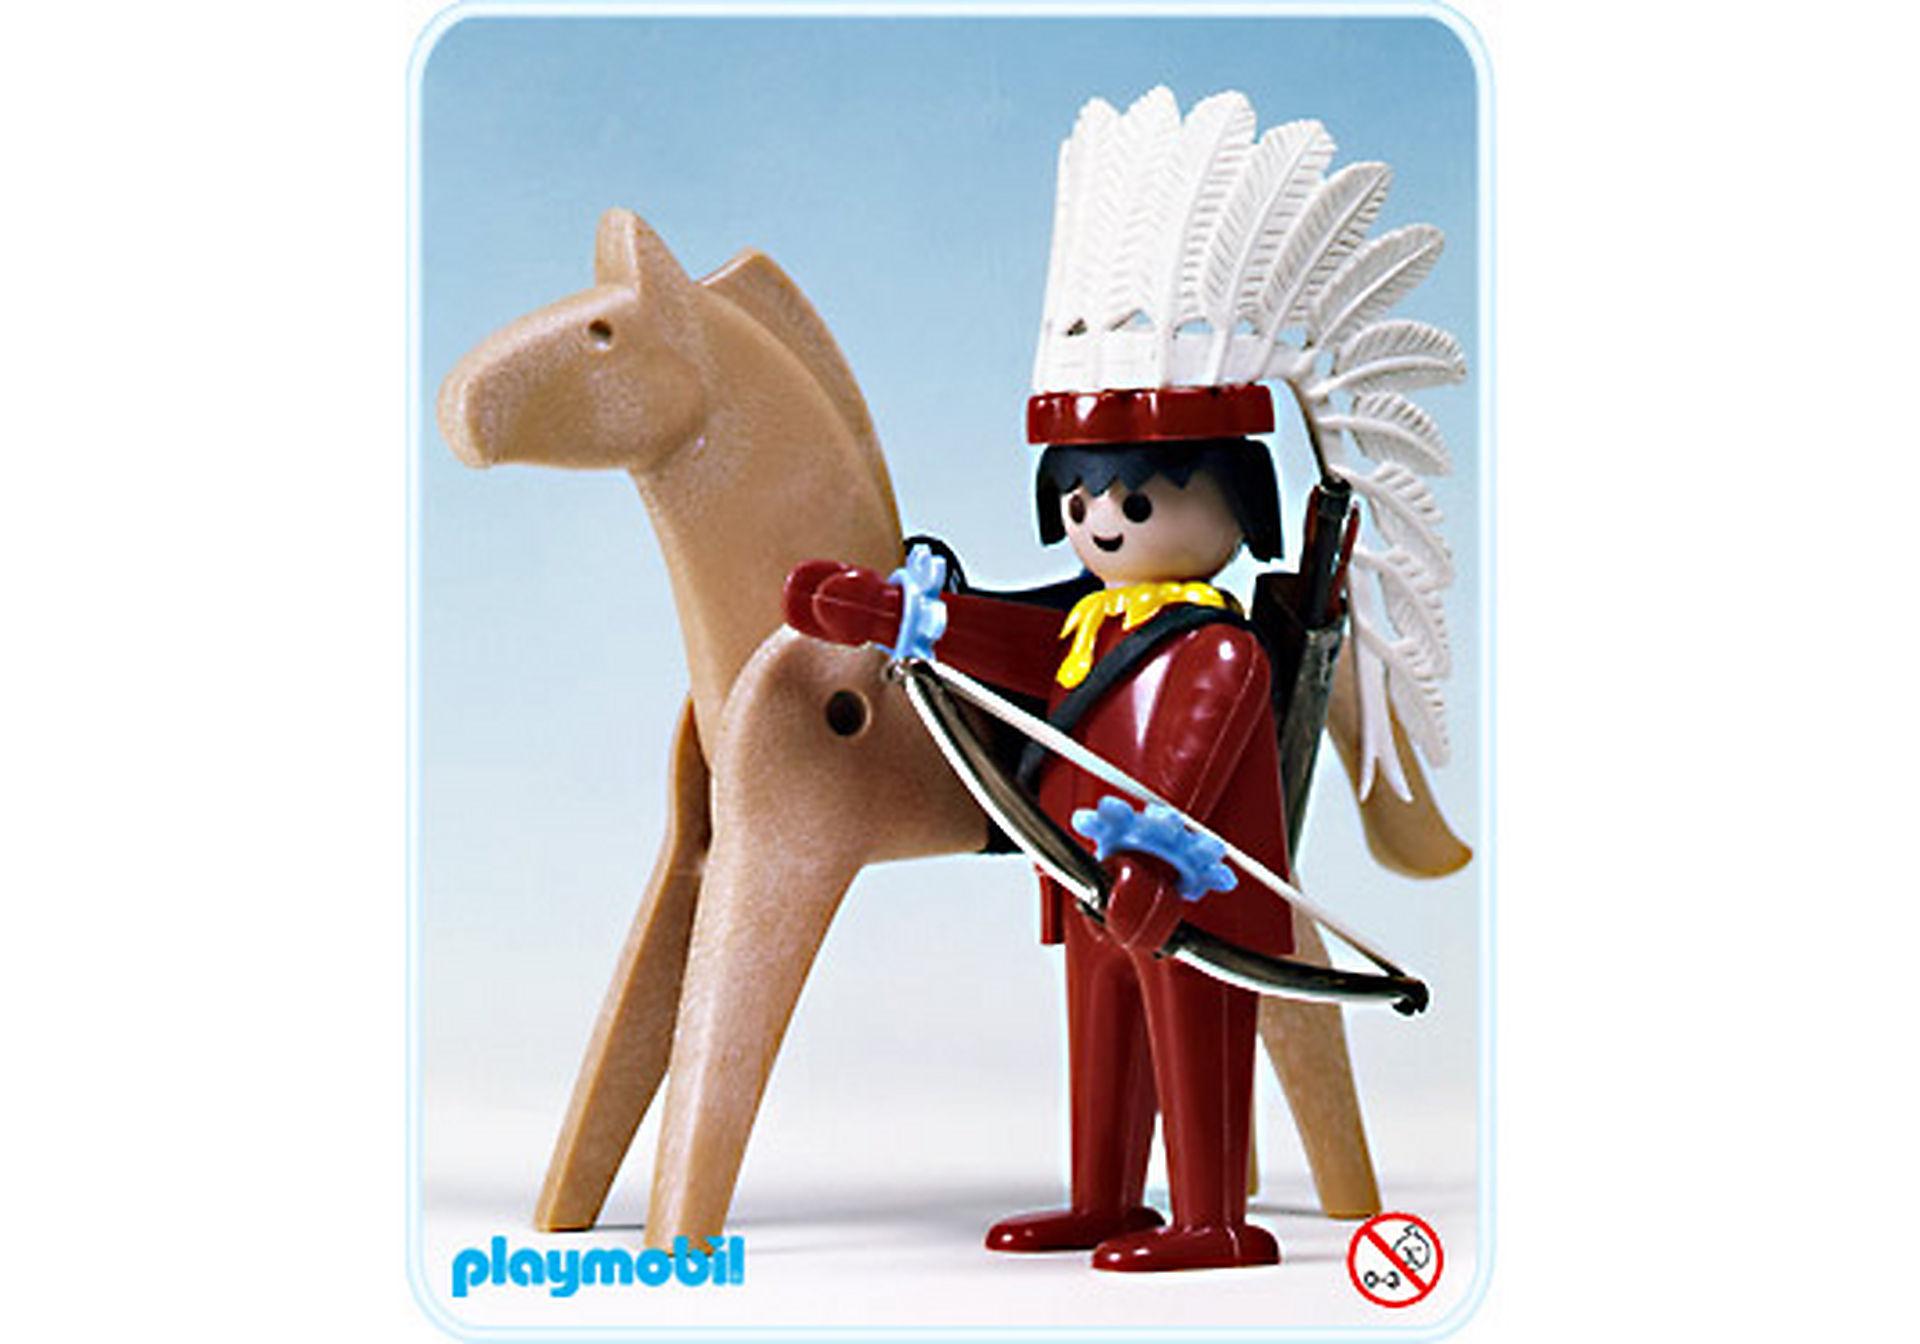 http://media.playmobil.com/i/playmobil/3351-A_product_detail/Indianer-Häuptling/Pferd